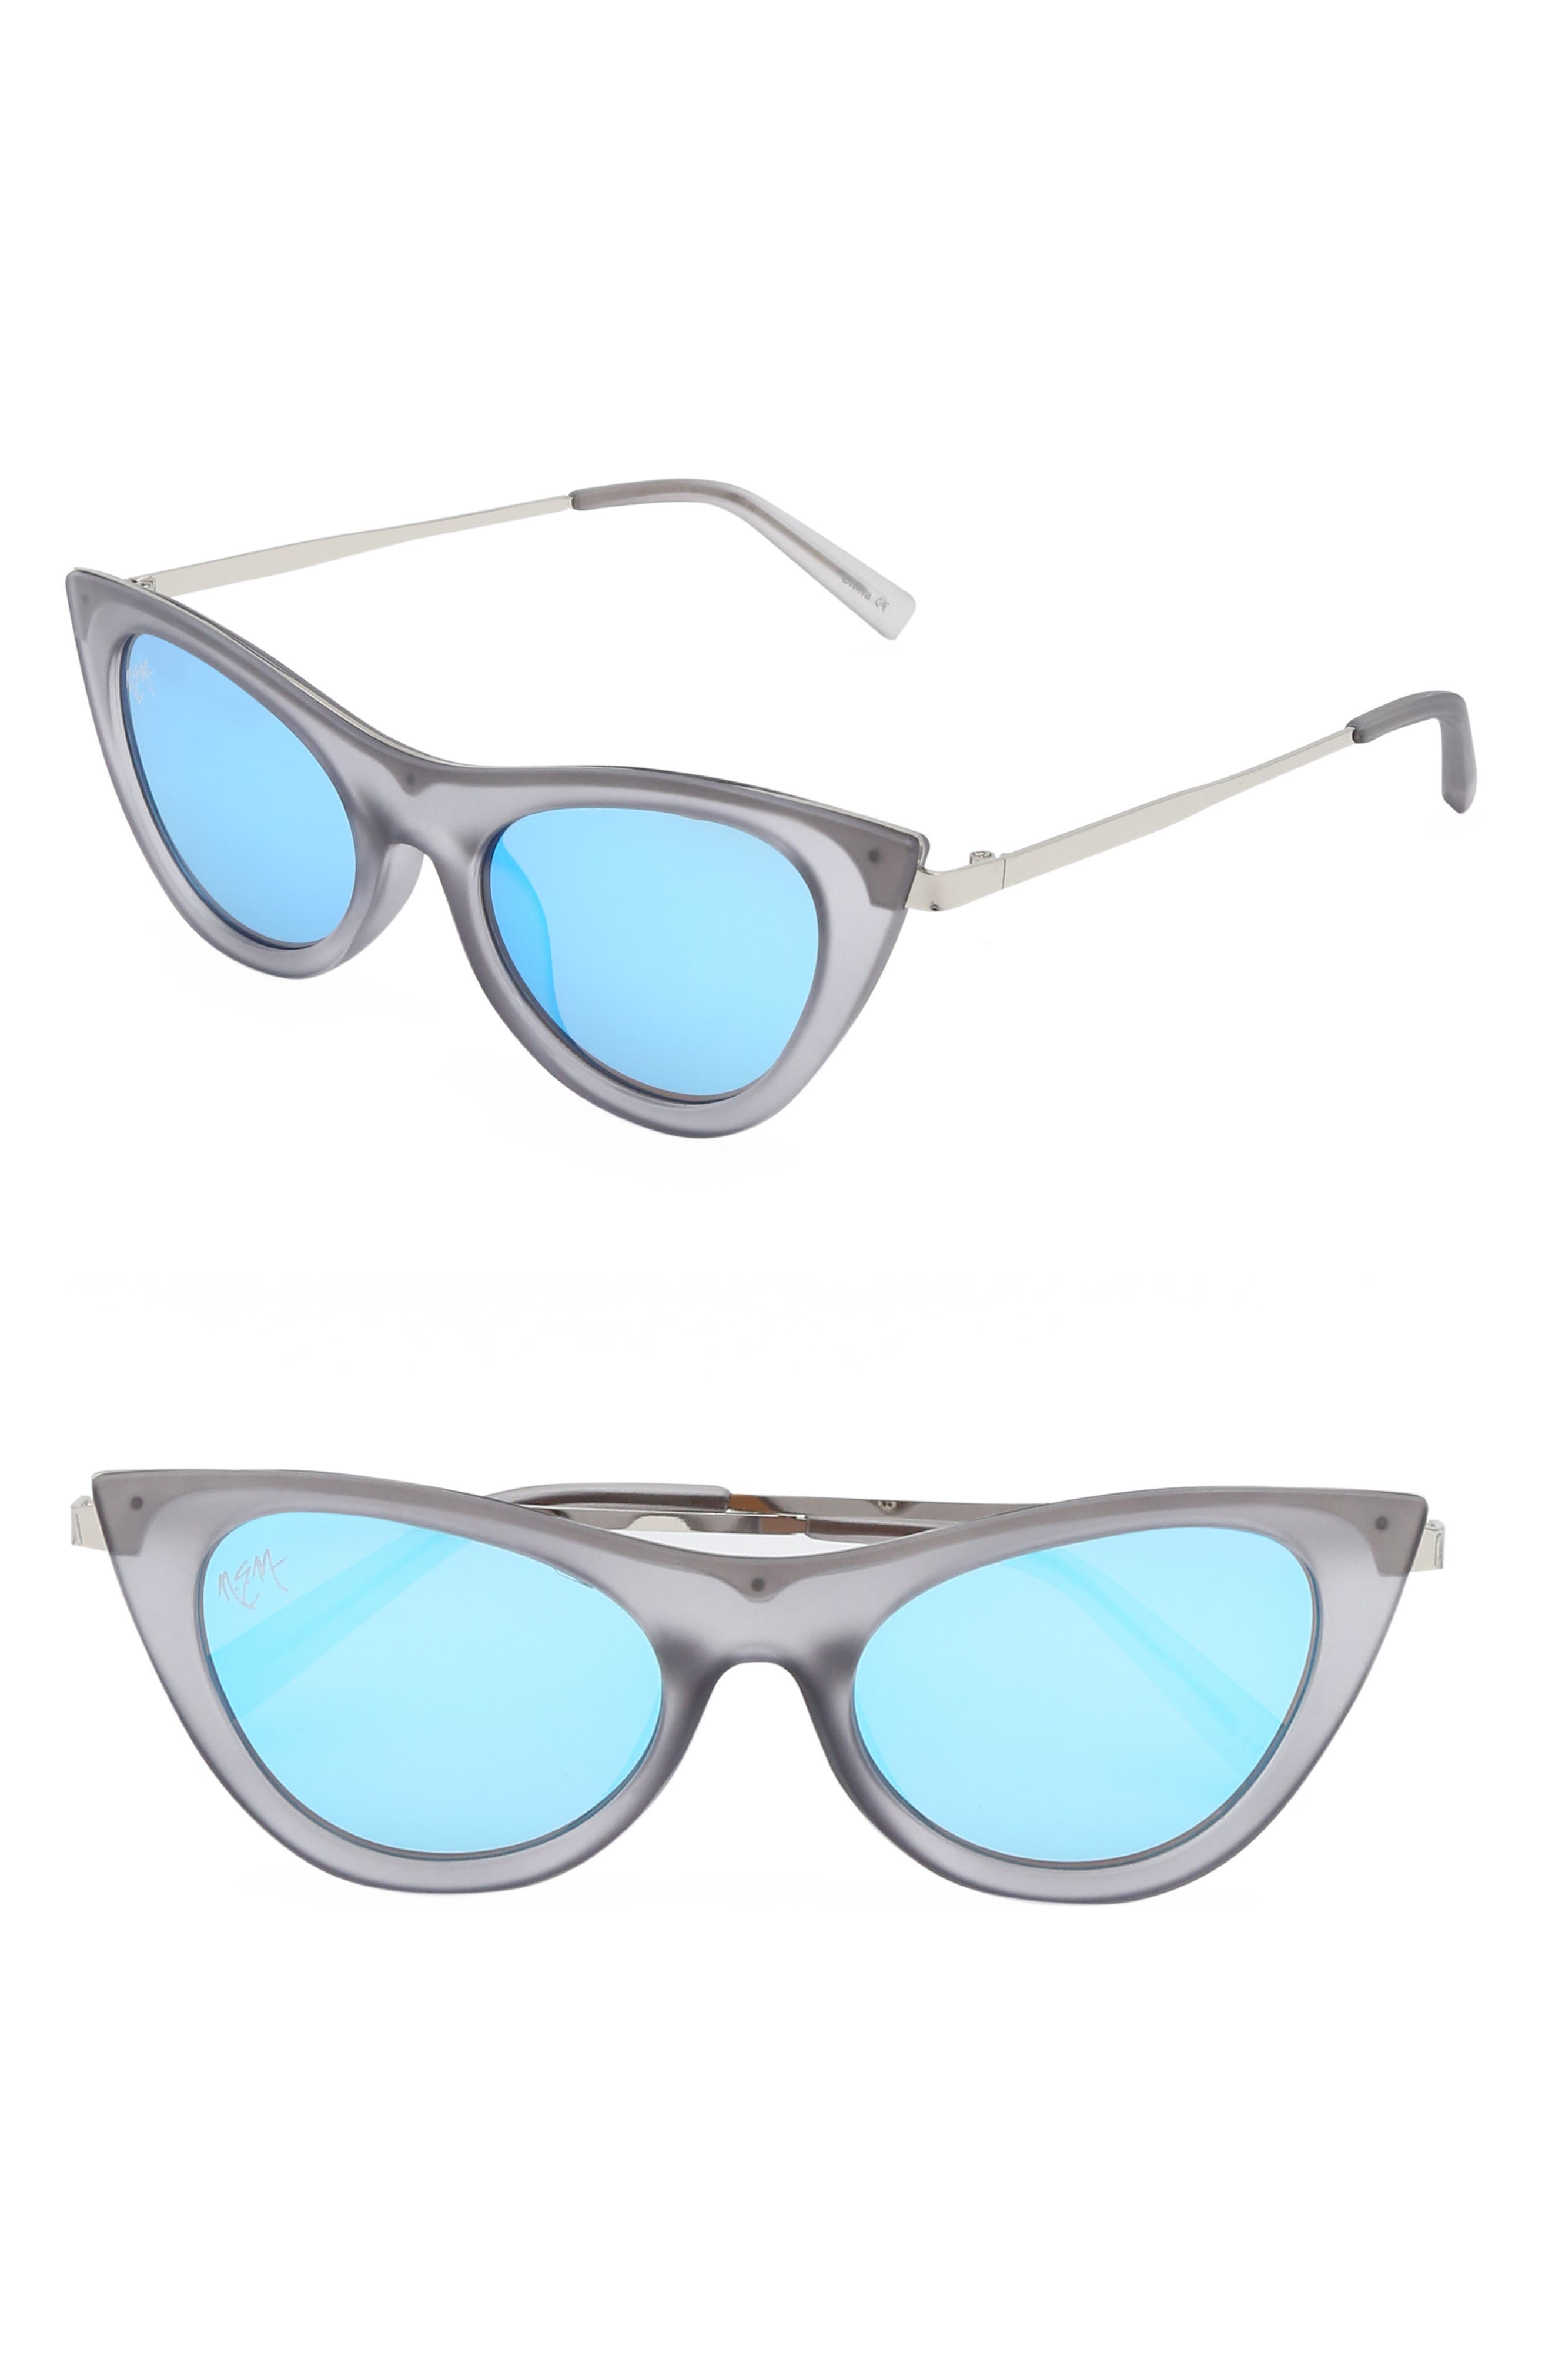 Nem Cruise 50Mm Cat Eye Sunglasses - Clear Grey W Sky Blue Mirror